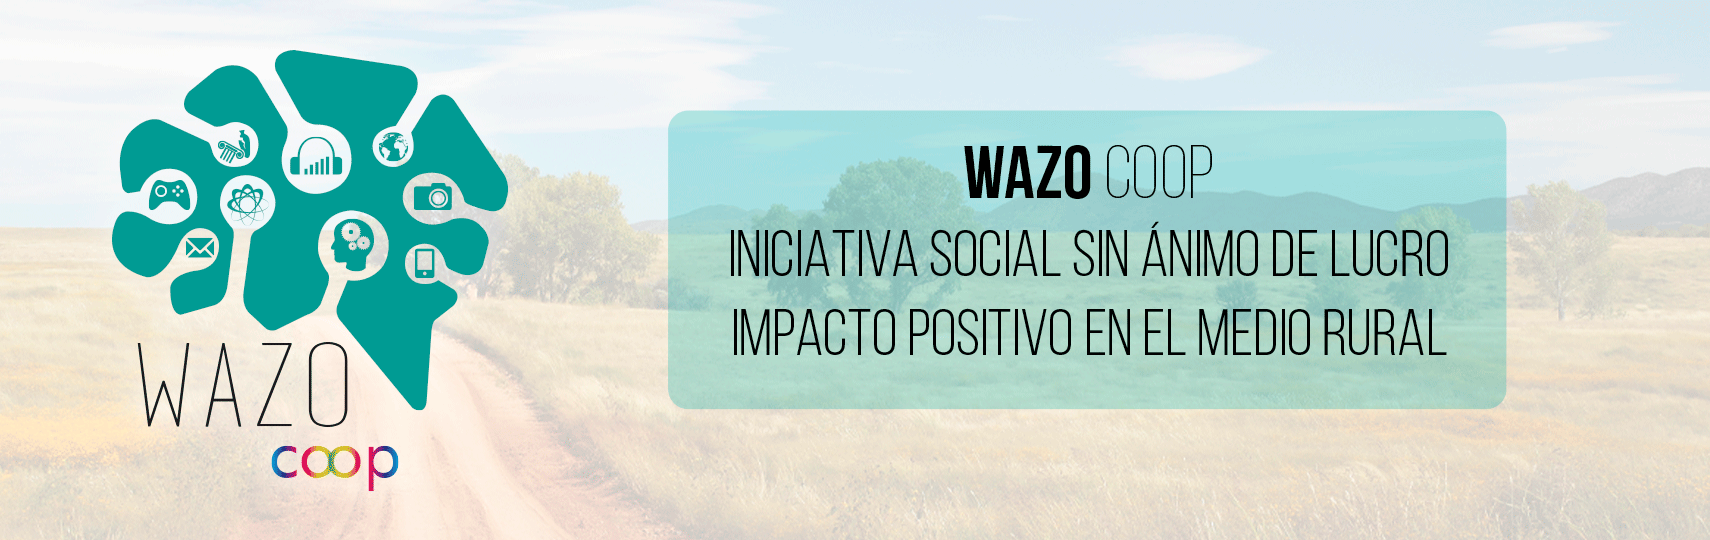 Wazo Coop Iniciativa Social Sin Animo De Lucro